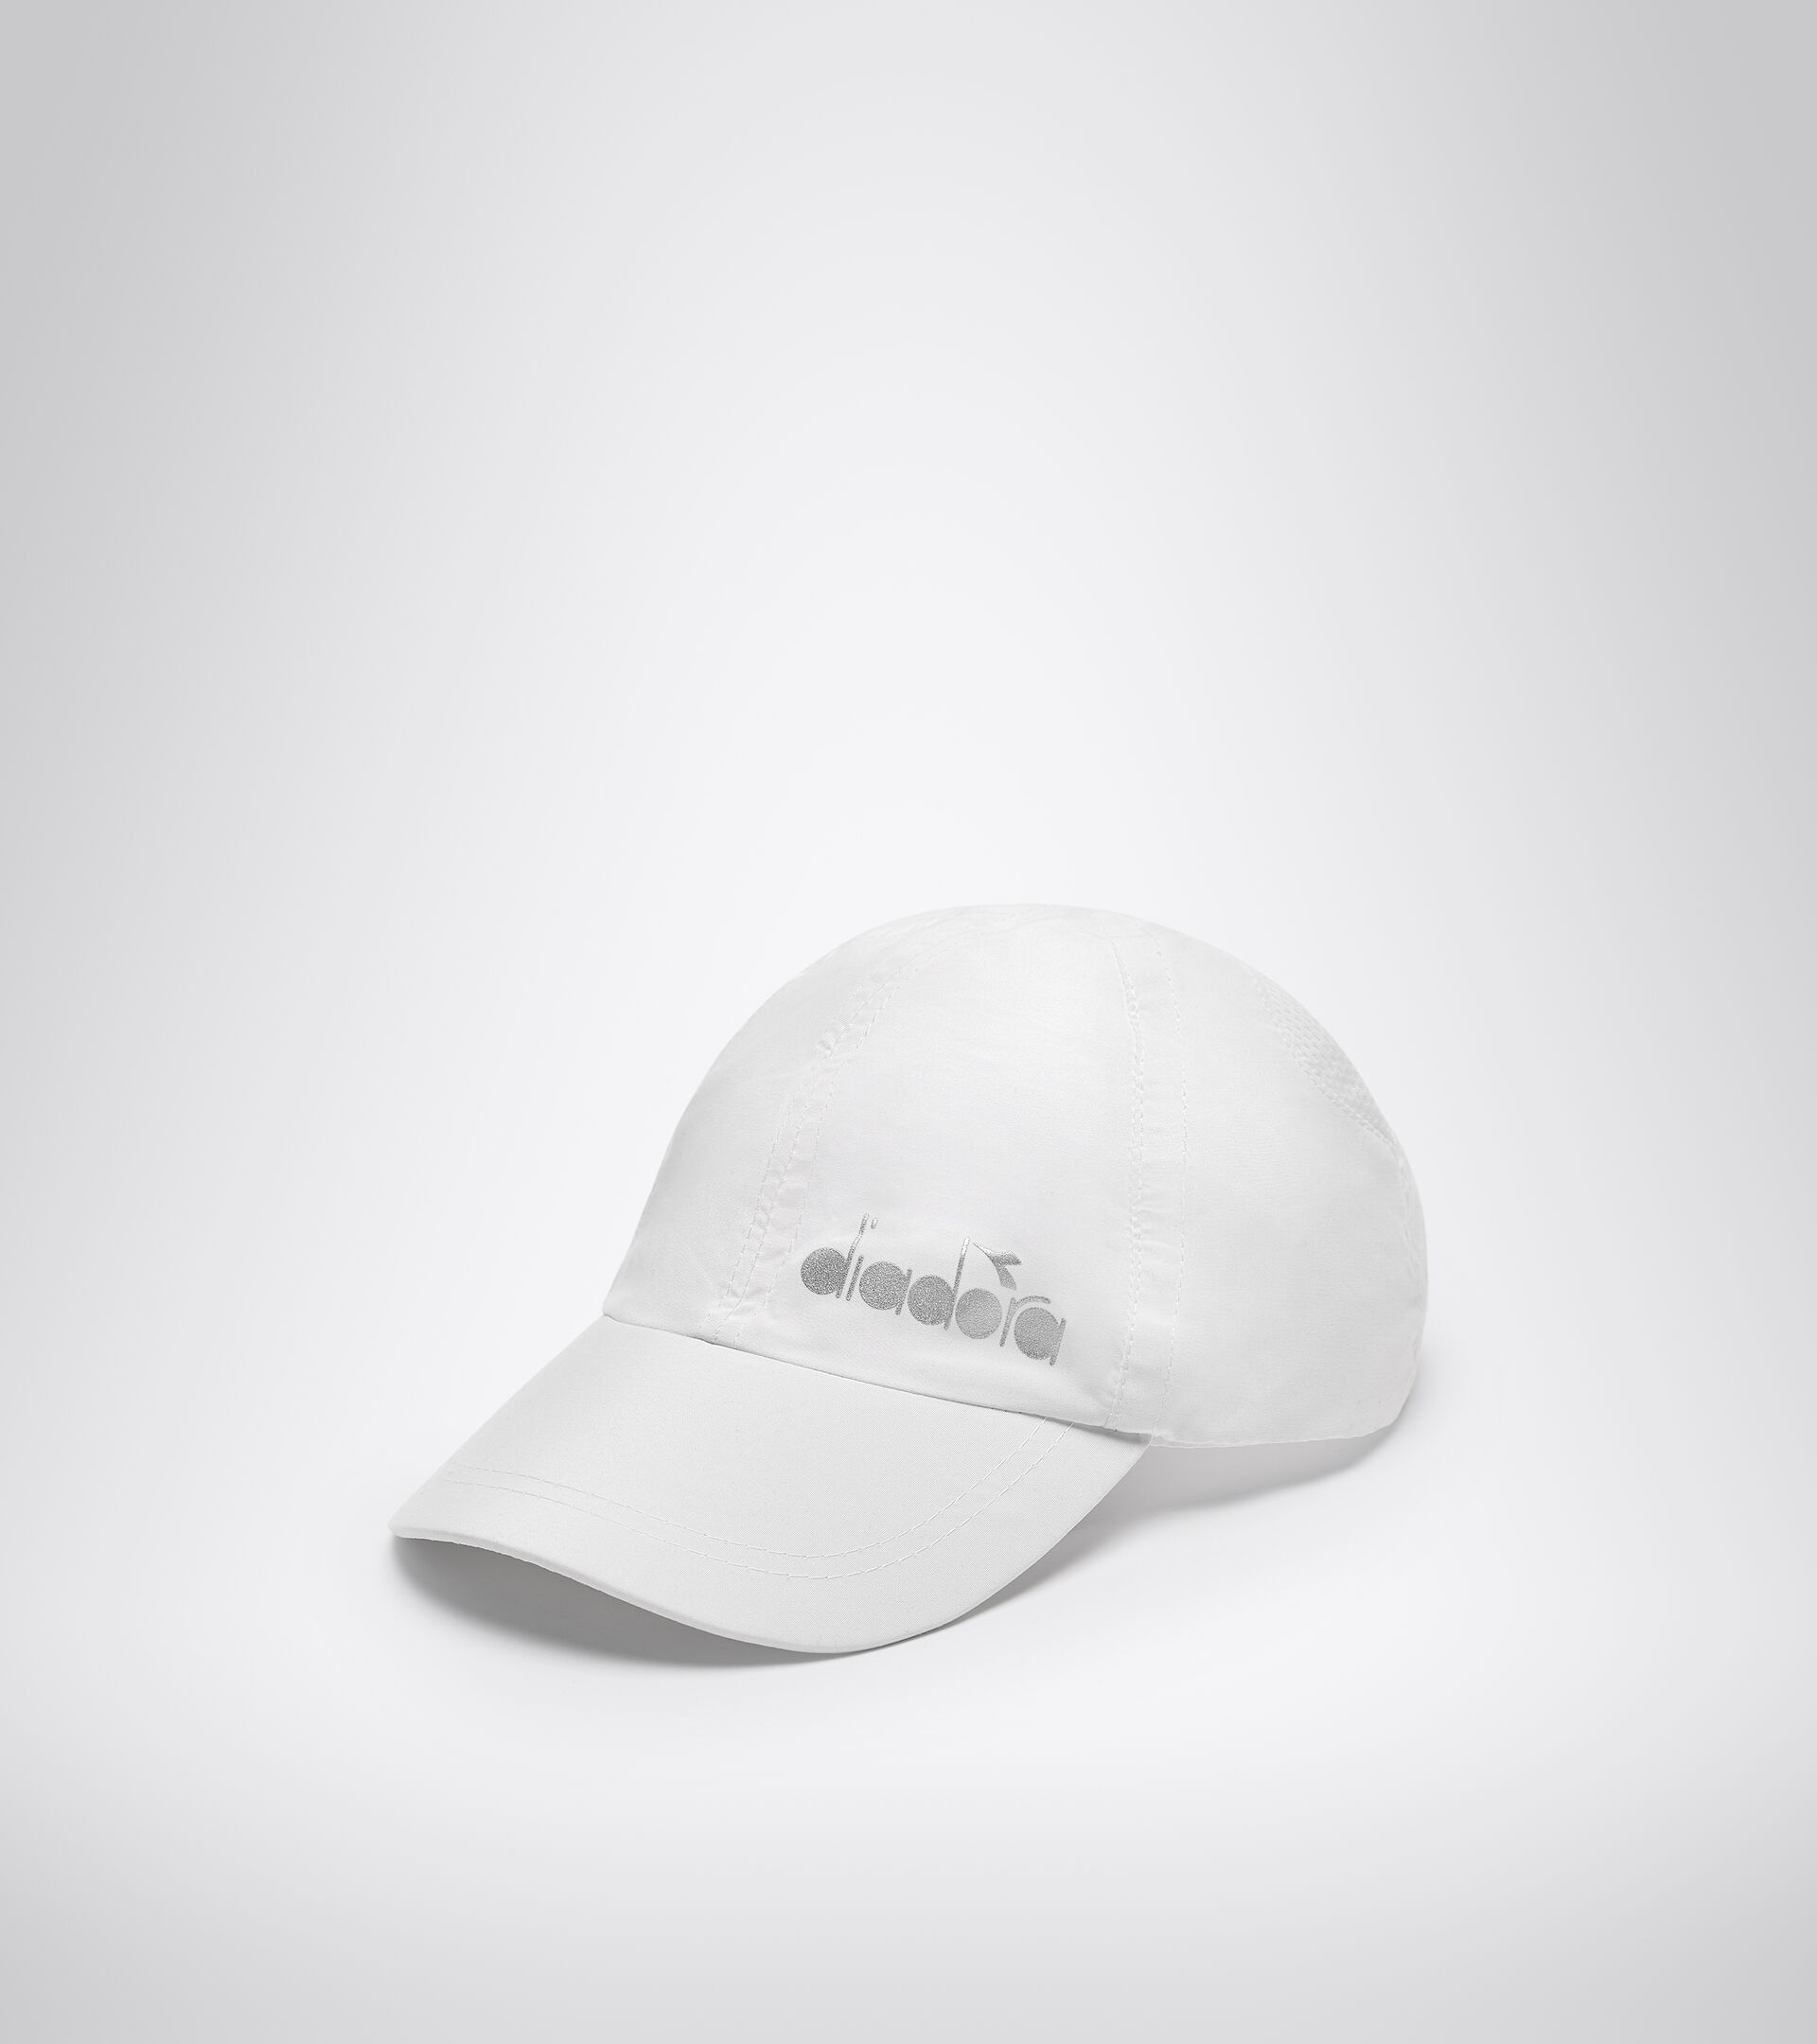 Cap CAP COURT OPTICAL WHITE - Diadora